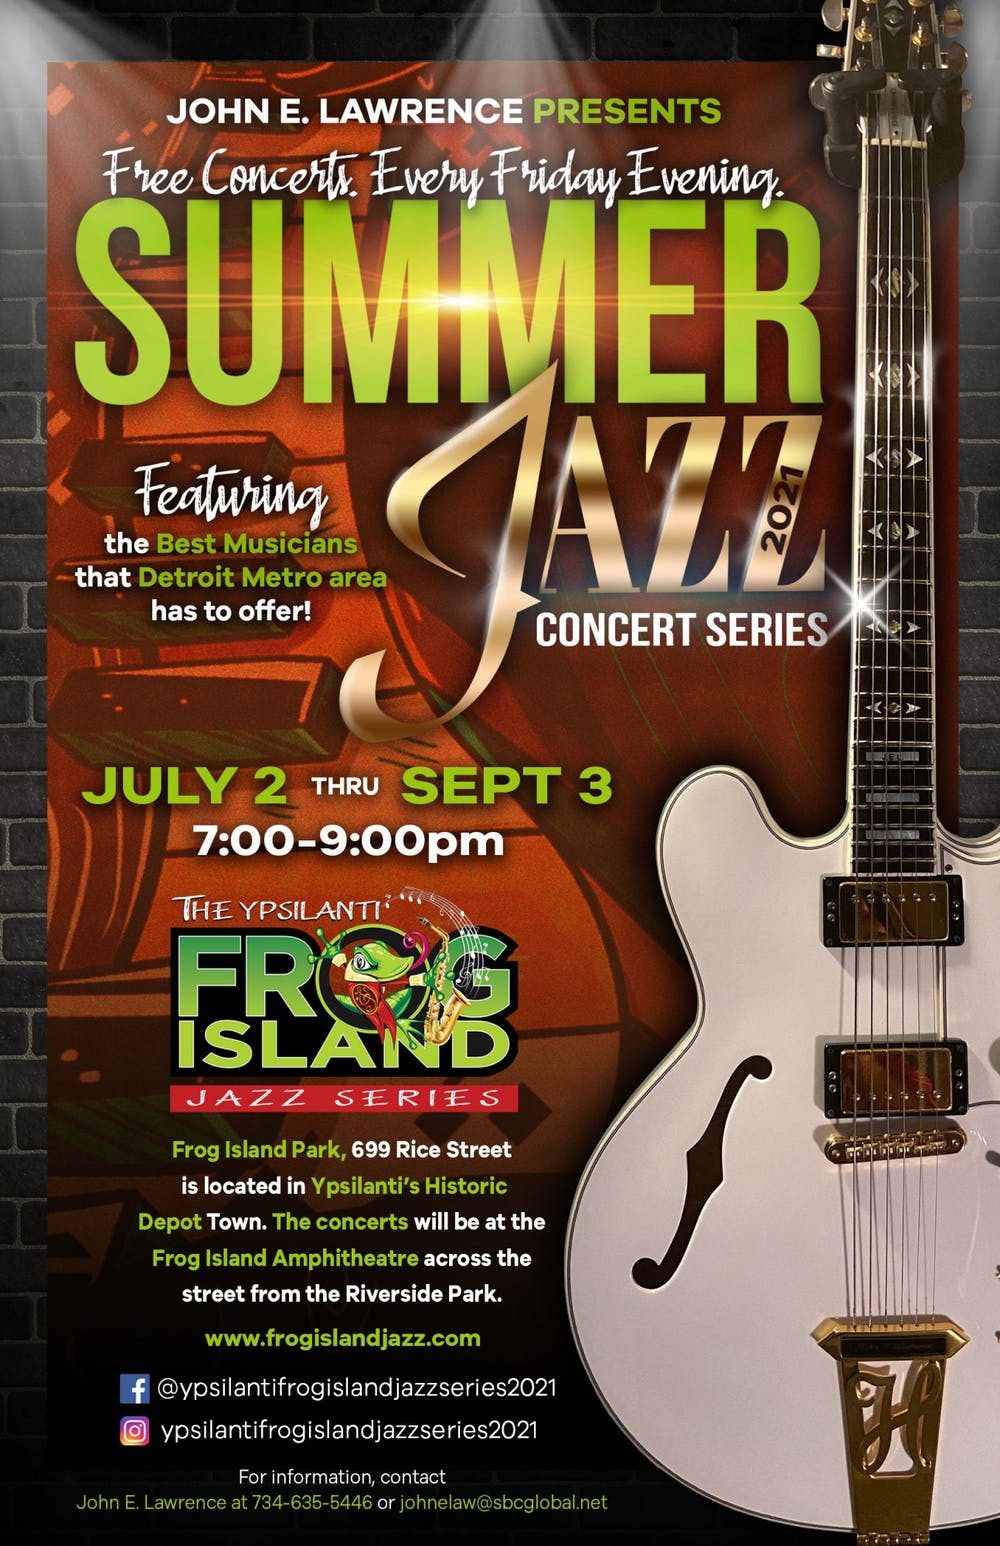 Ypsilanti musician John E. Lawrence hosts The Ypsilanti Frog Island Jazz Series all summer long